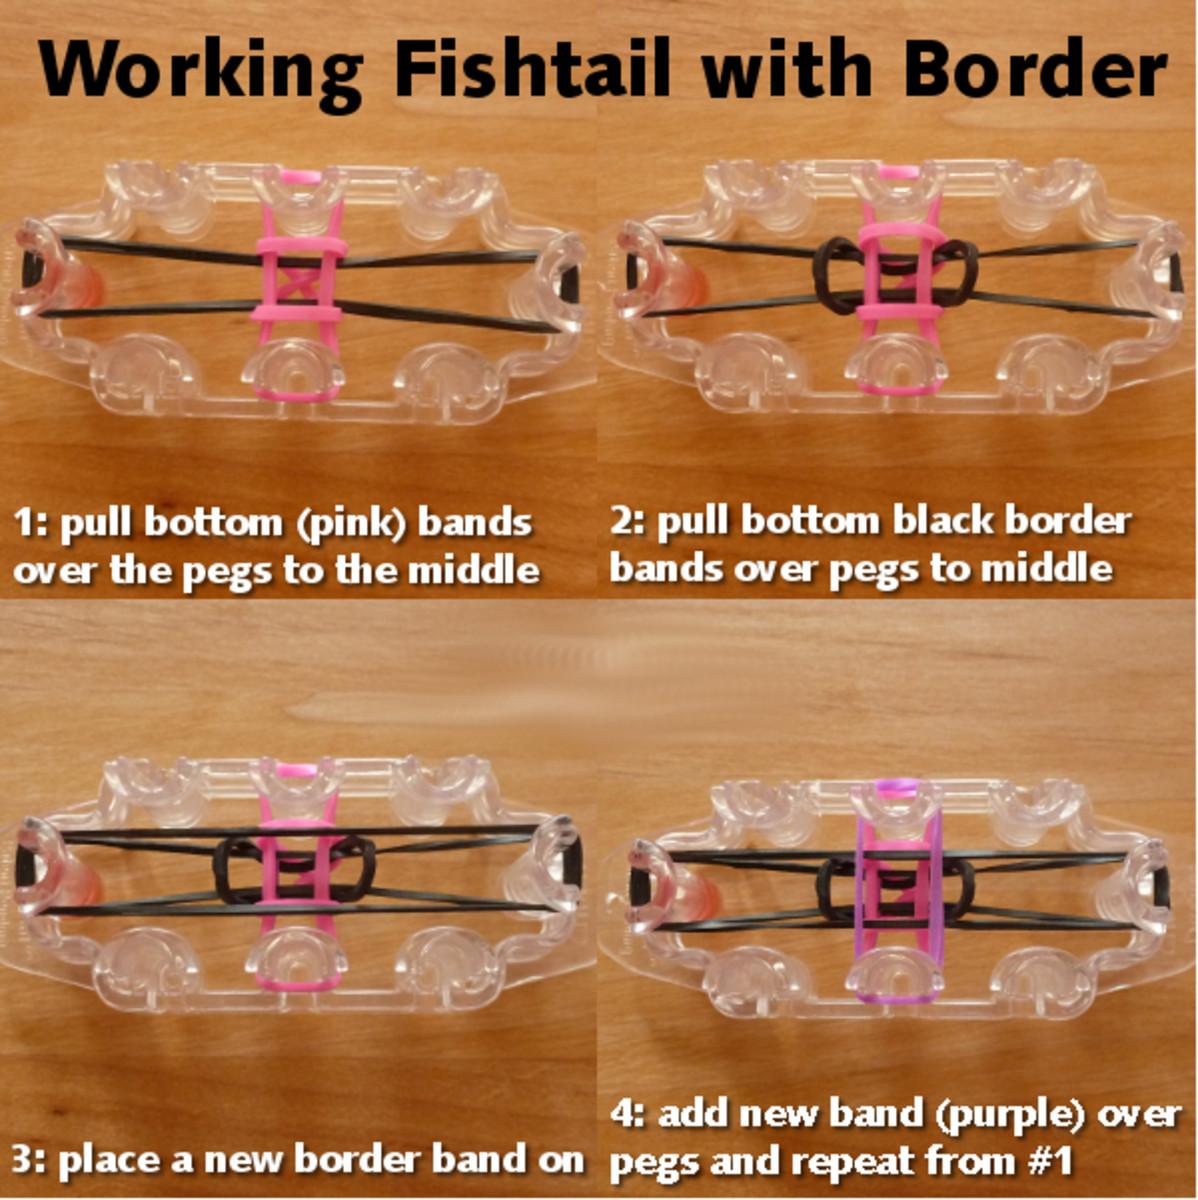 Basic working guide for making fishtail monster tail bracelet with border